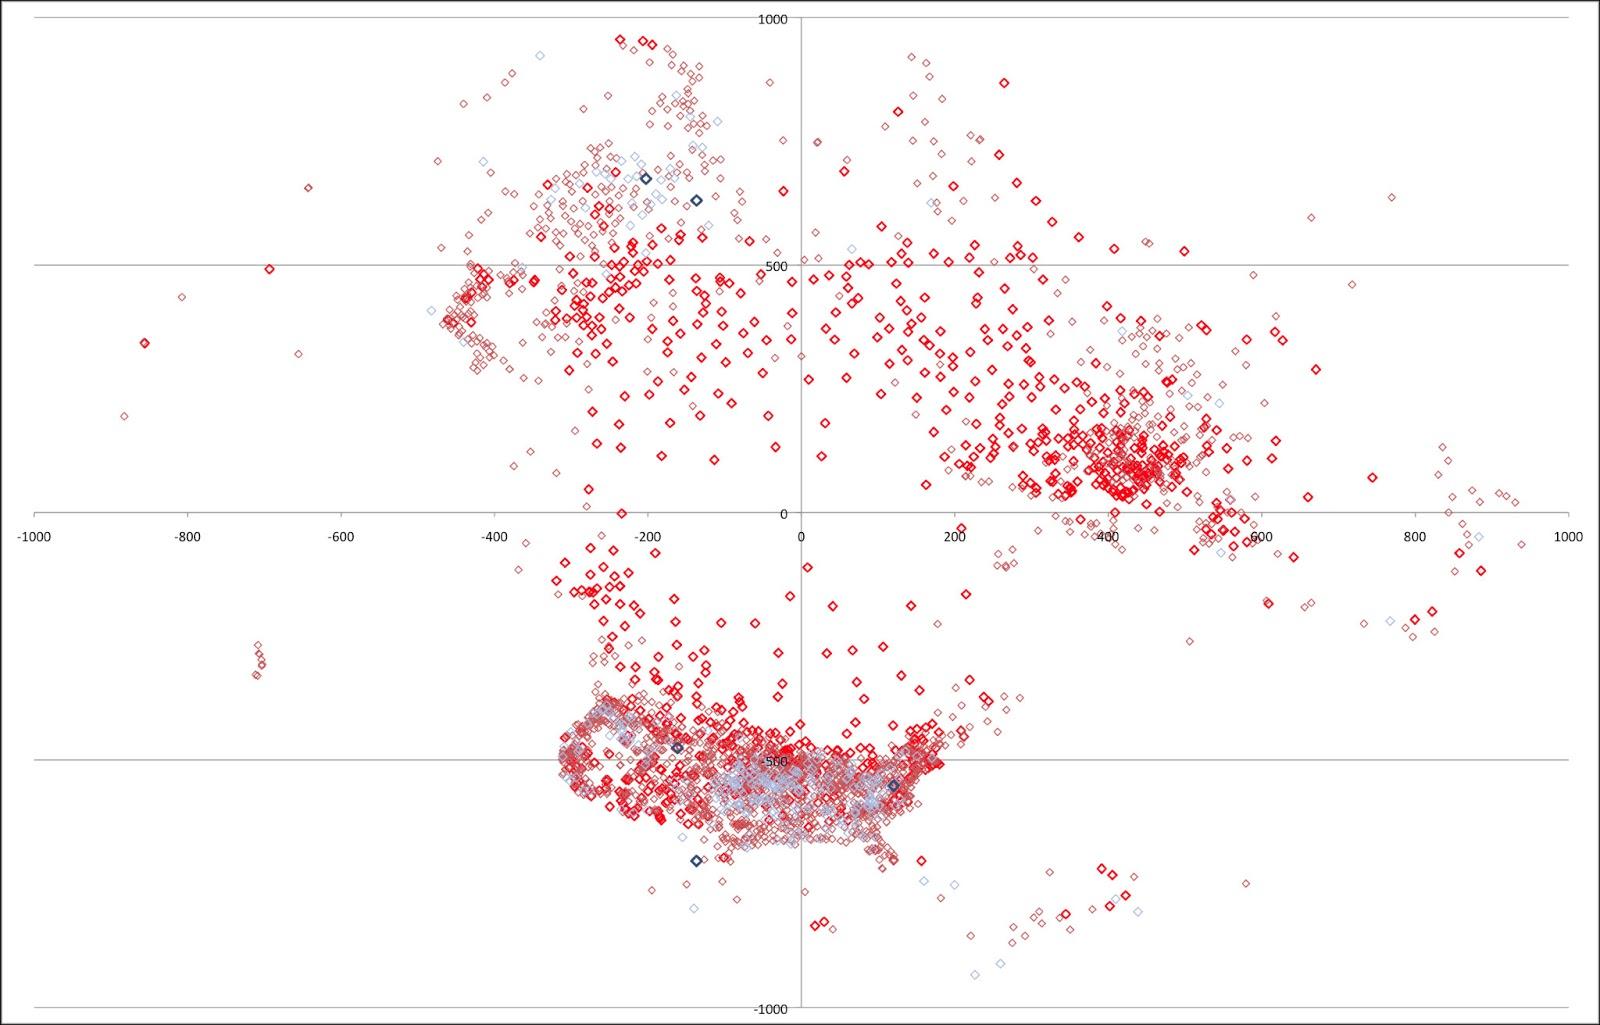 Math Year 2013 Consistent Weather Station Map Northern Hemisphere